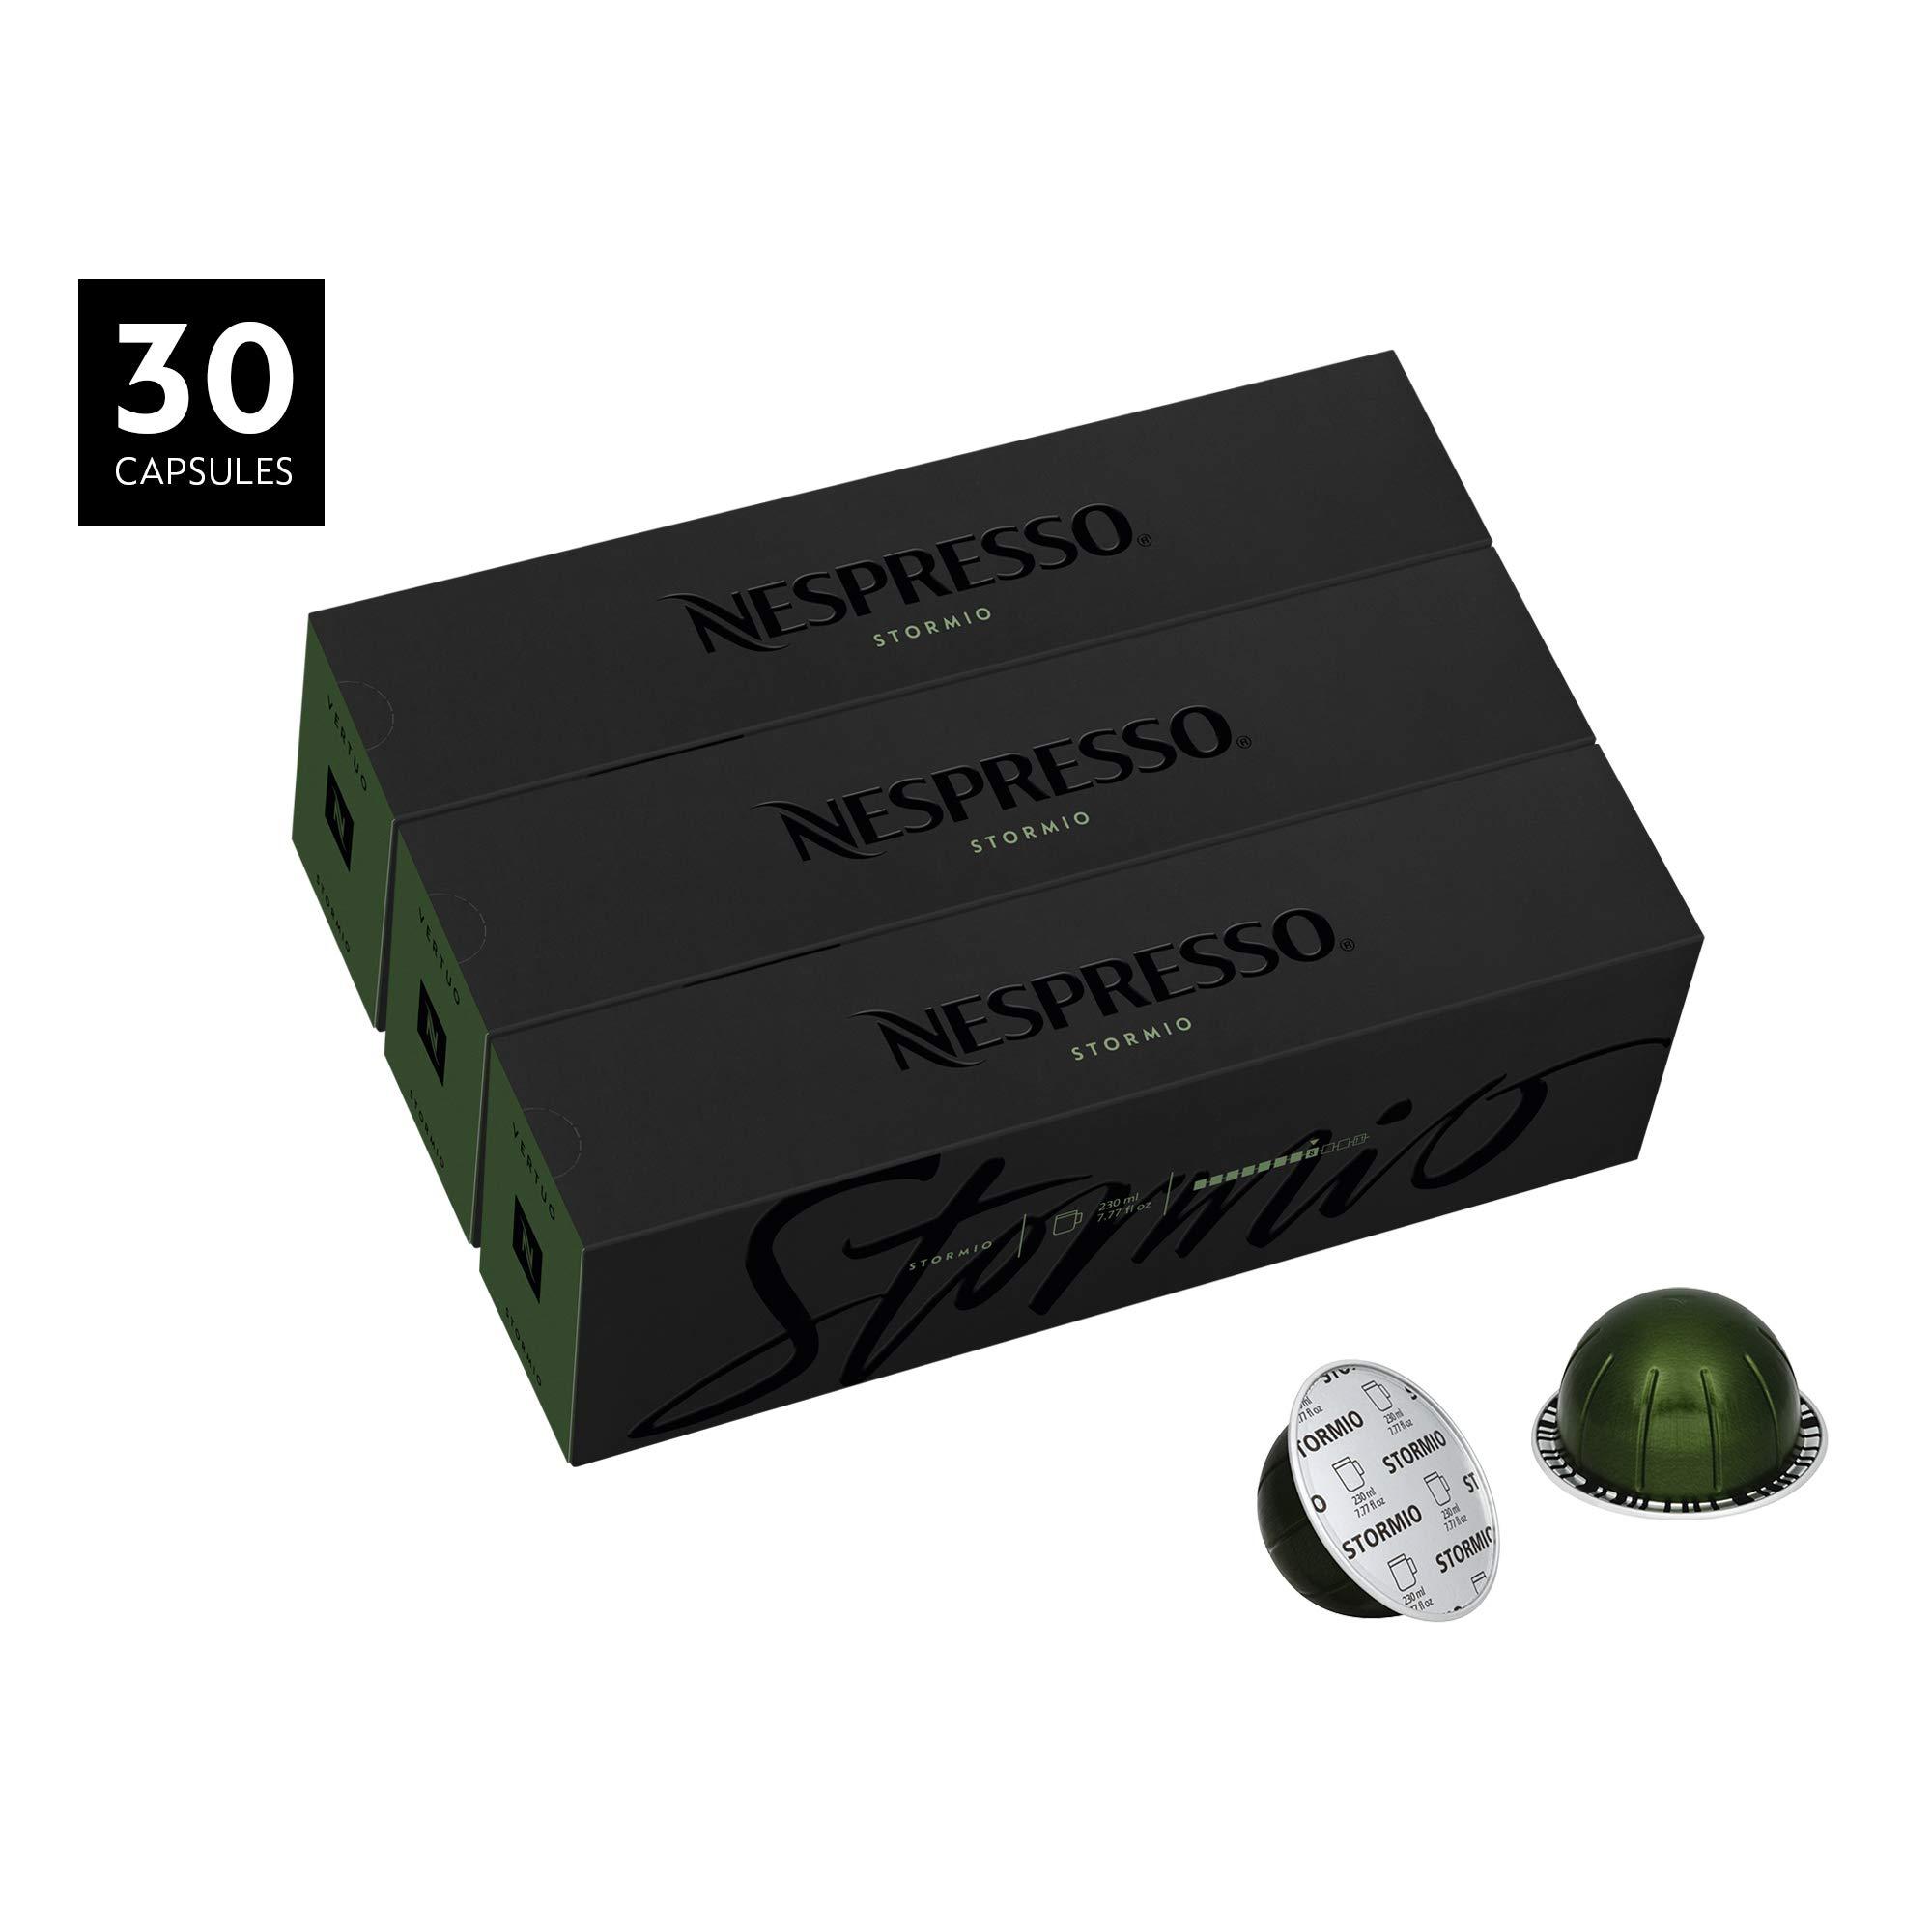 Nespresso VertuoLine Coffee, Stormio, 30 Capsules by Nespresso